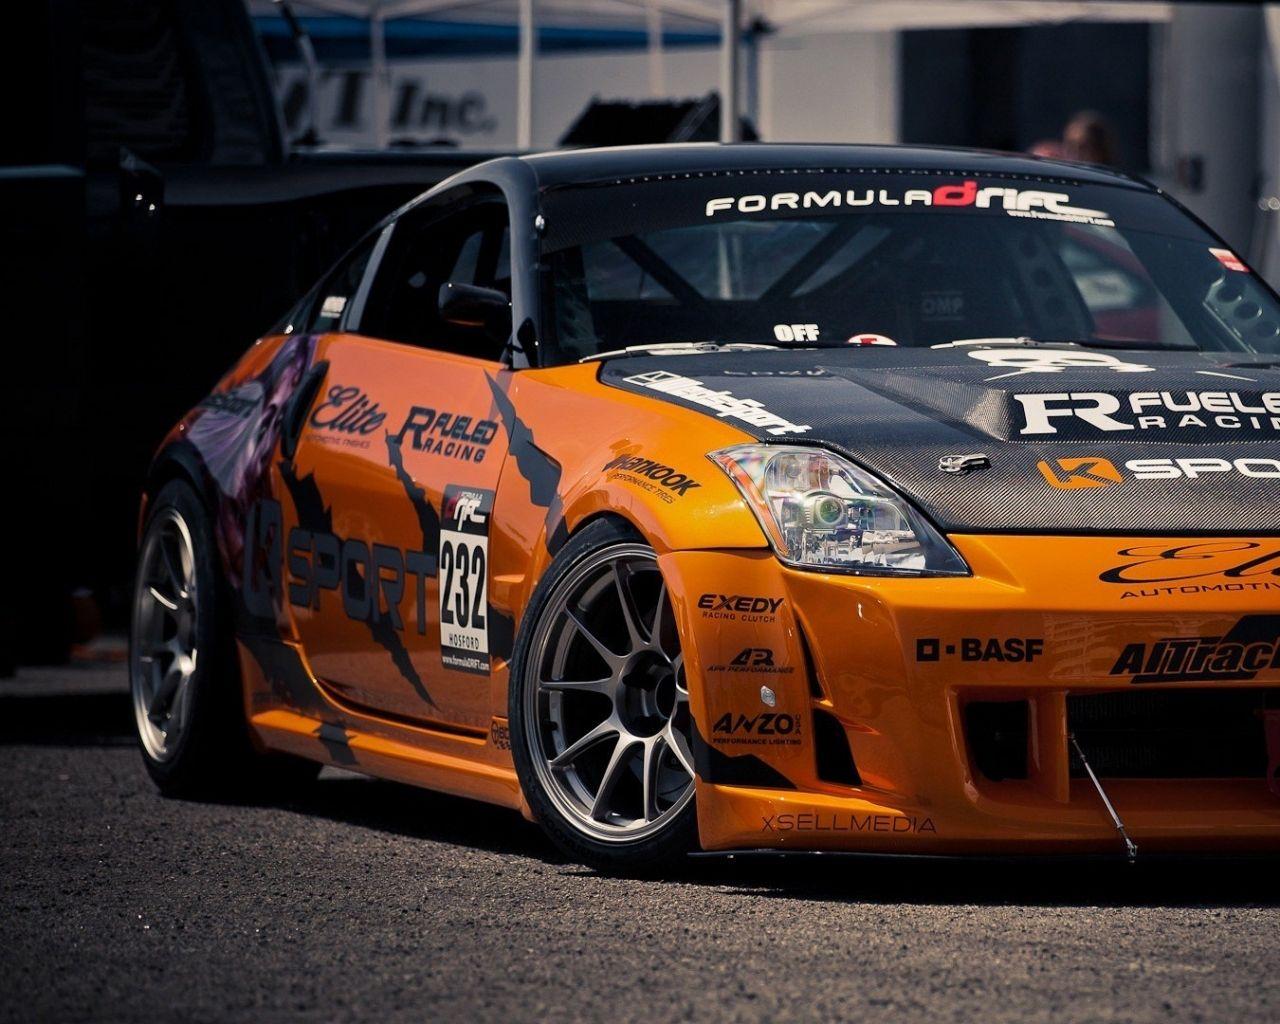 1280x1024 Cars Nissan 350z Orange Cars Jdm 1920x1080 Wallpaper .